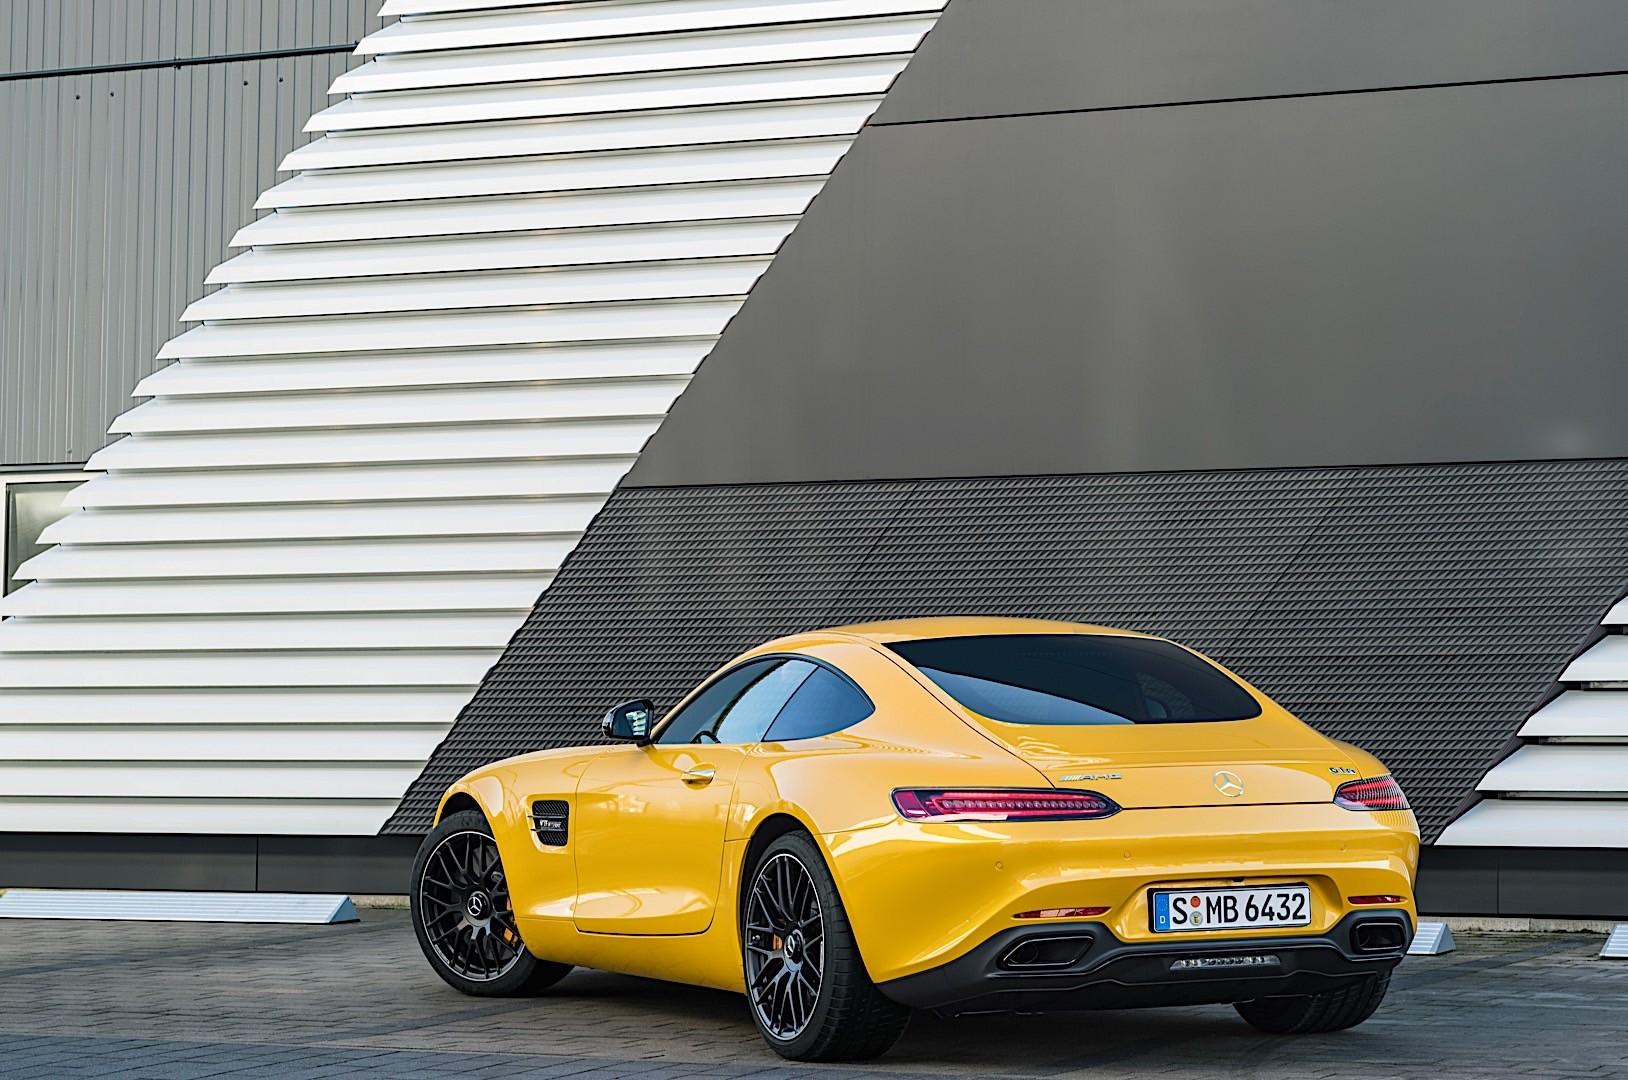 https://s1.cdn.autoevolution.com/images/gallery/MERCEDES-BENZ-AMG-GT-S-5869_4.jpg